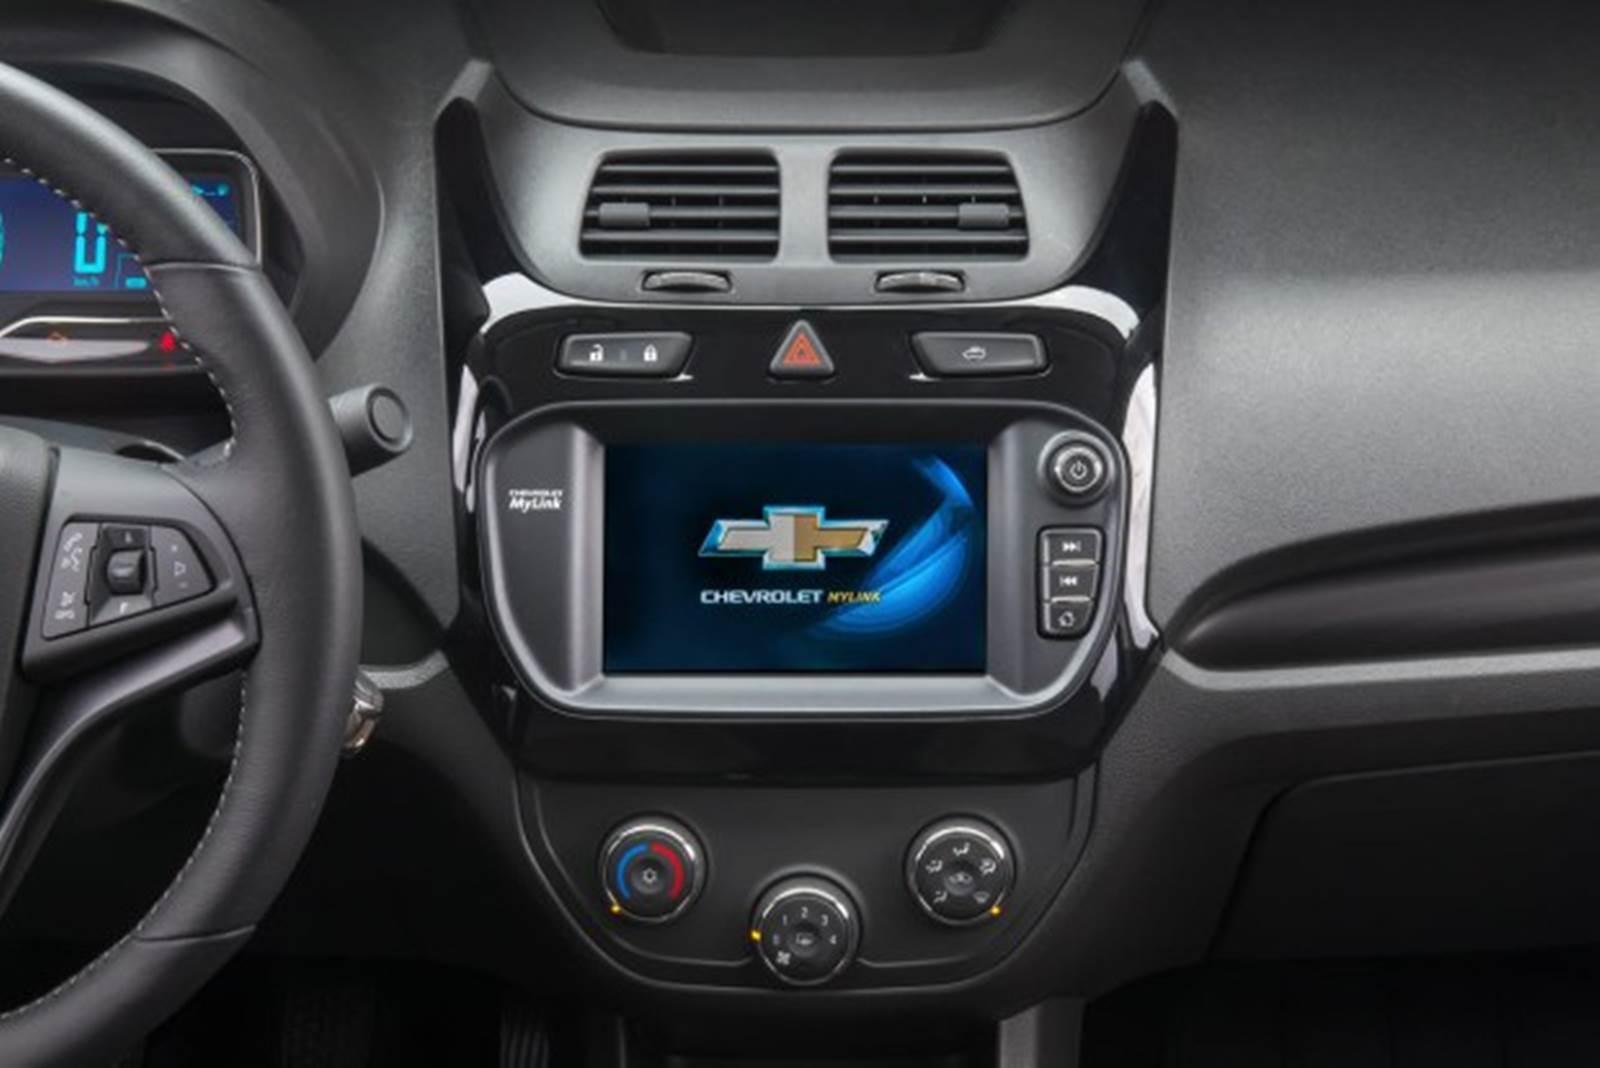 Chevrolet cobalt ltz interior